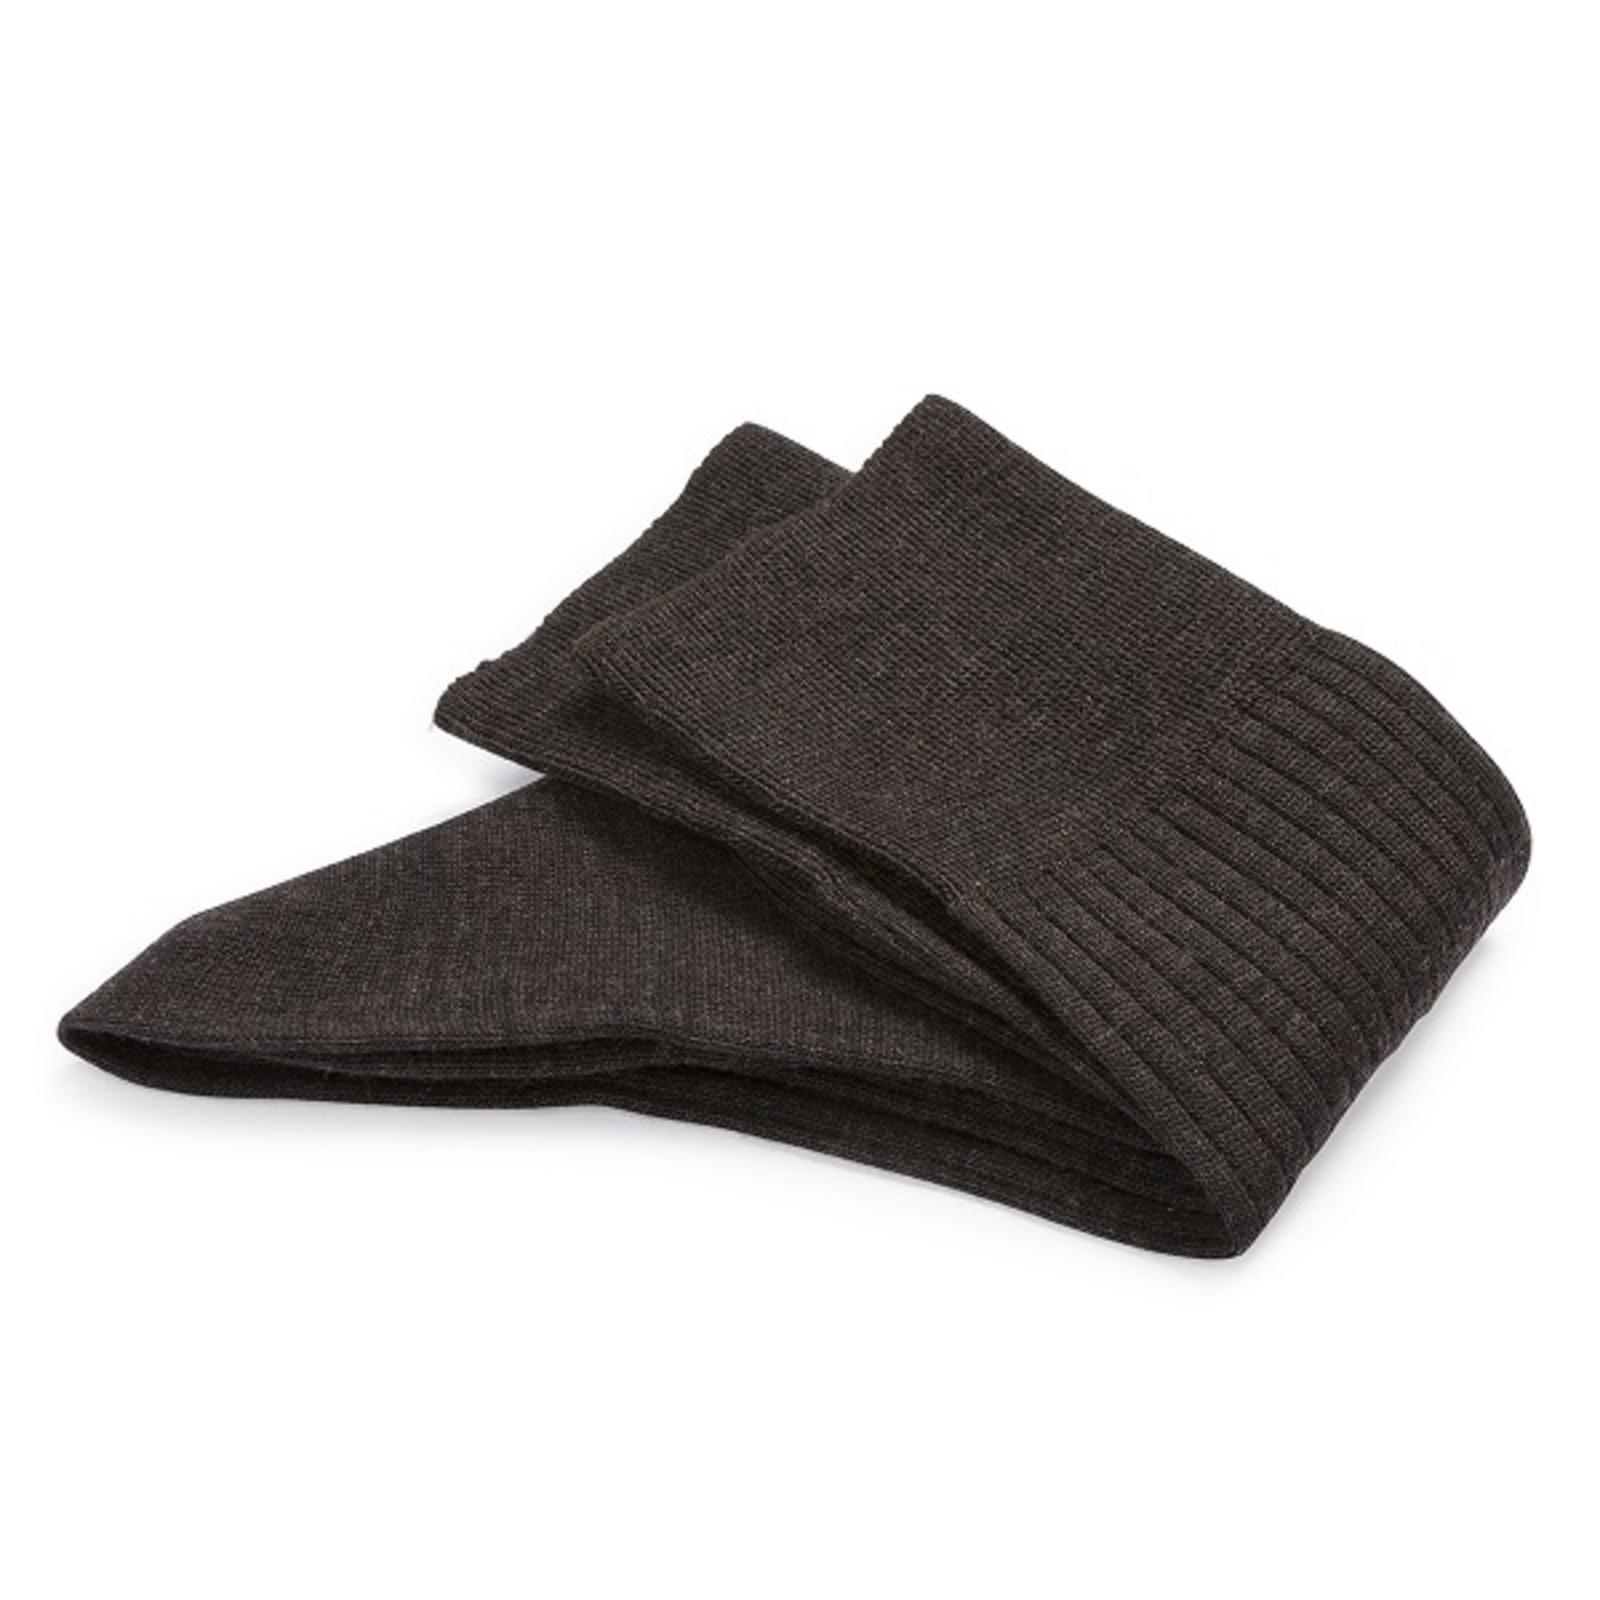 Carlo Lanza Darkbrown wool socks